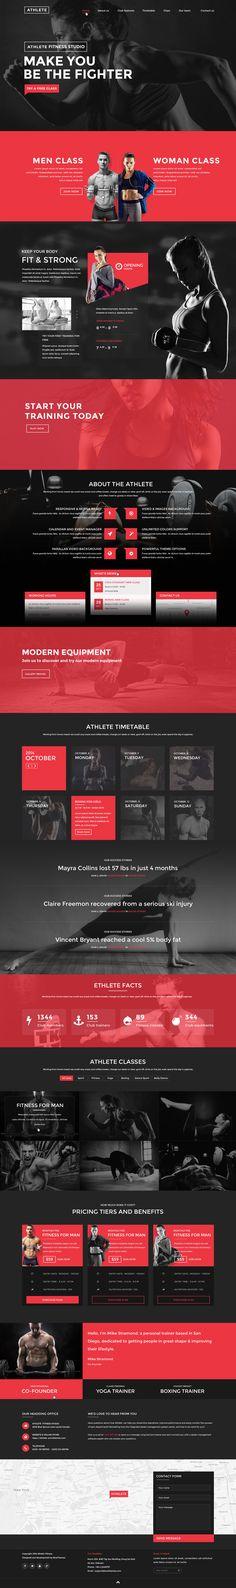 Athlete - Fitness and Sport PSD Template #webinopoly.com